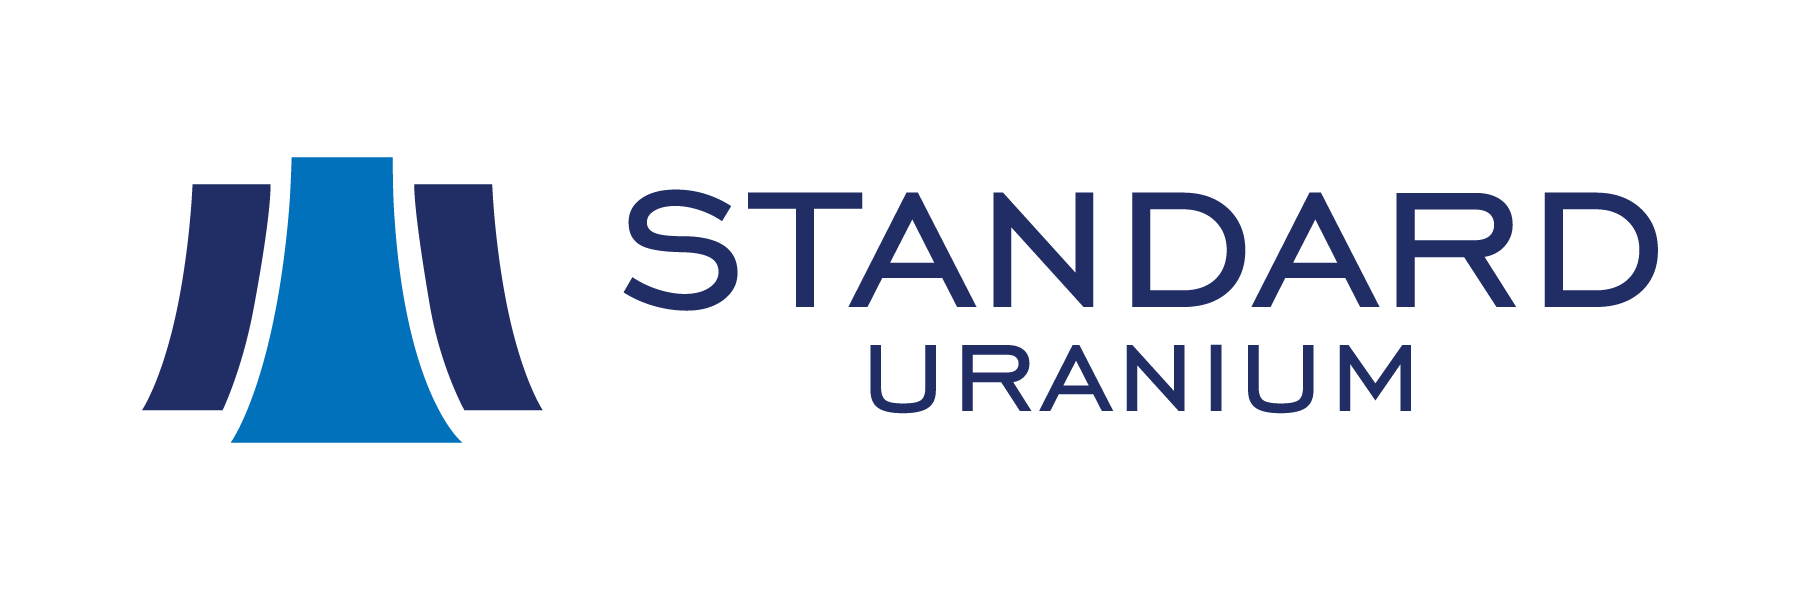 Standard Uranium Begins Phase II Winter Drill Program at its Flagship Davidson River Project